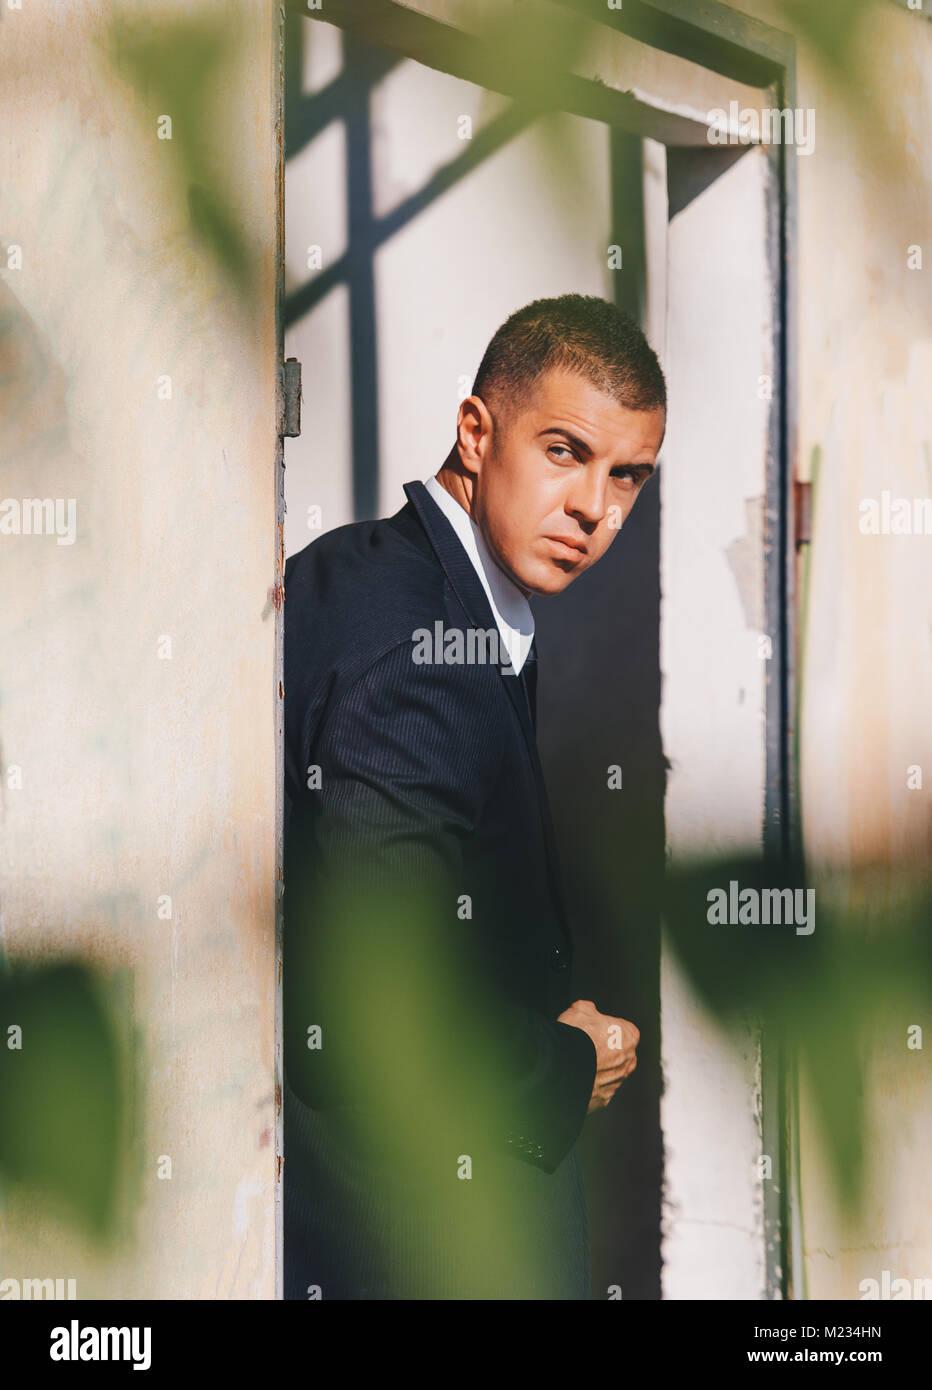 Handsome man in black suit and sunglasses. Secret agent, mafia, bodyguard concept. - Stock Image